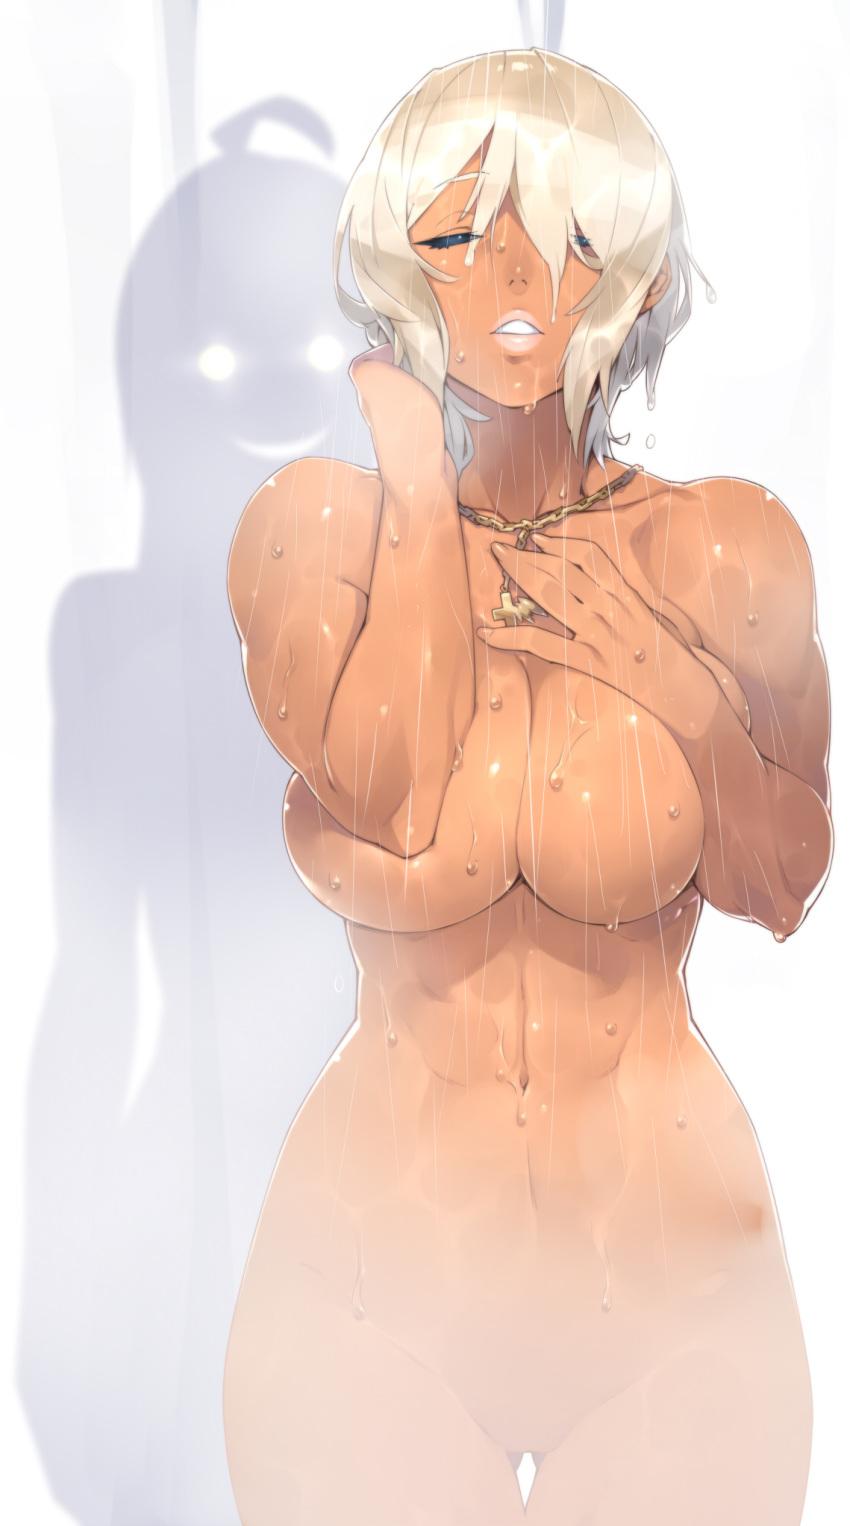 year hentai old female 23 Oretachi ni tsubasa wa nai under the innocent sky